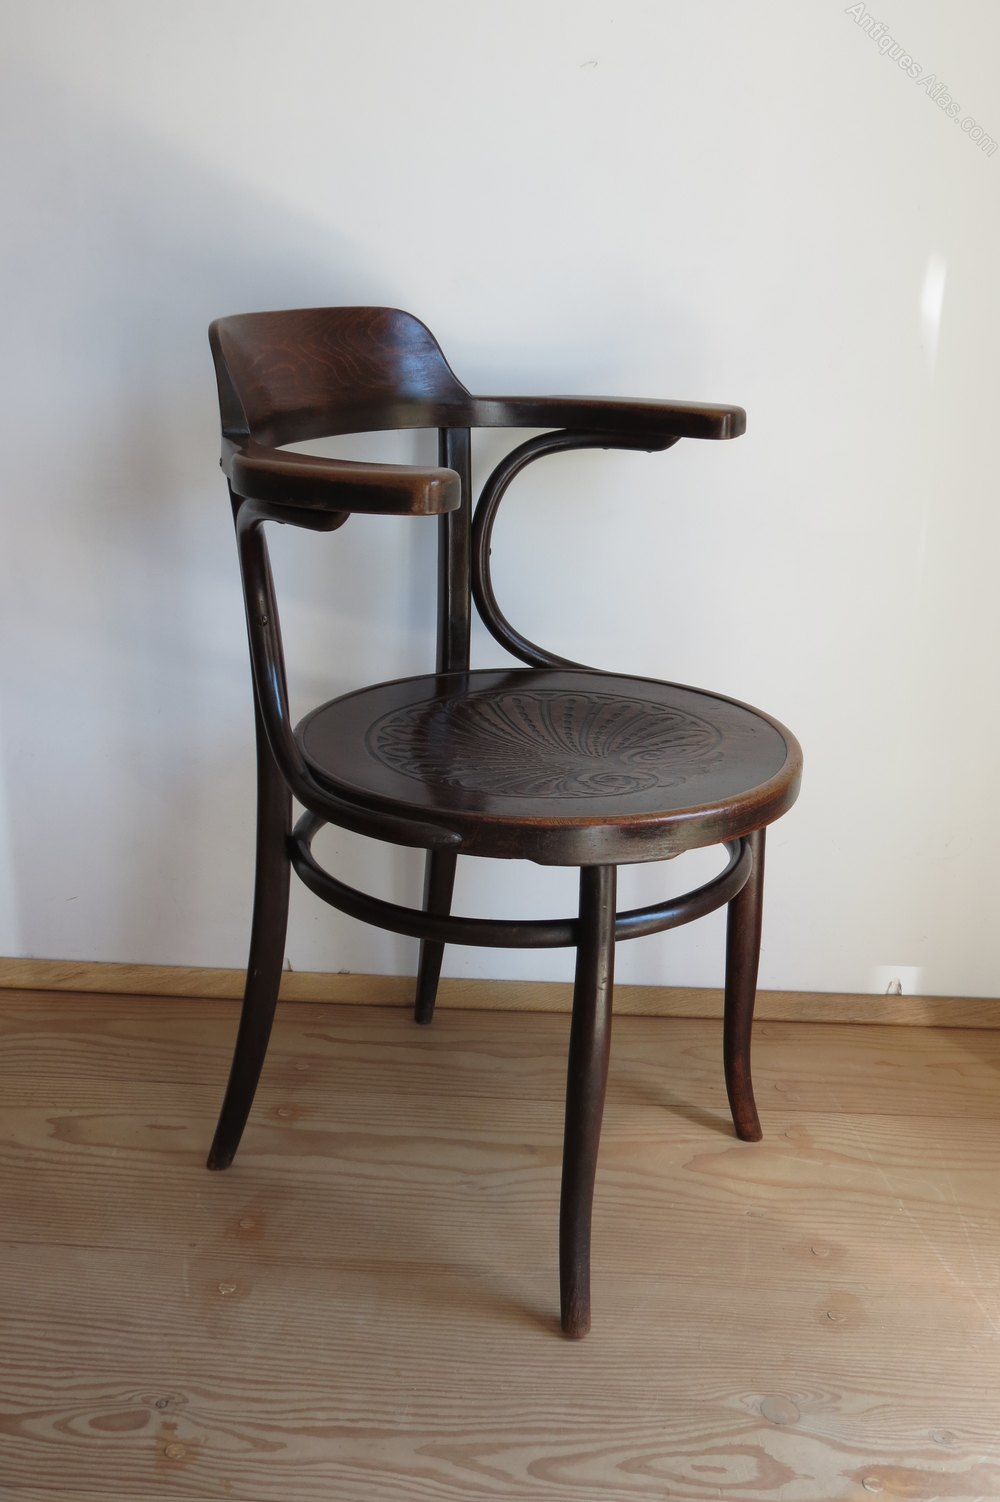 Bentwood Chair By J And J Kohn Austria 1900  Antiques Atlas